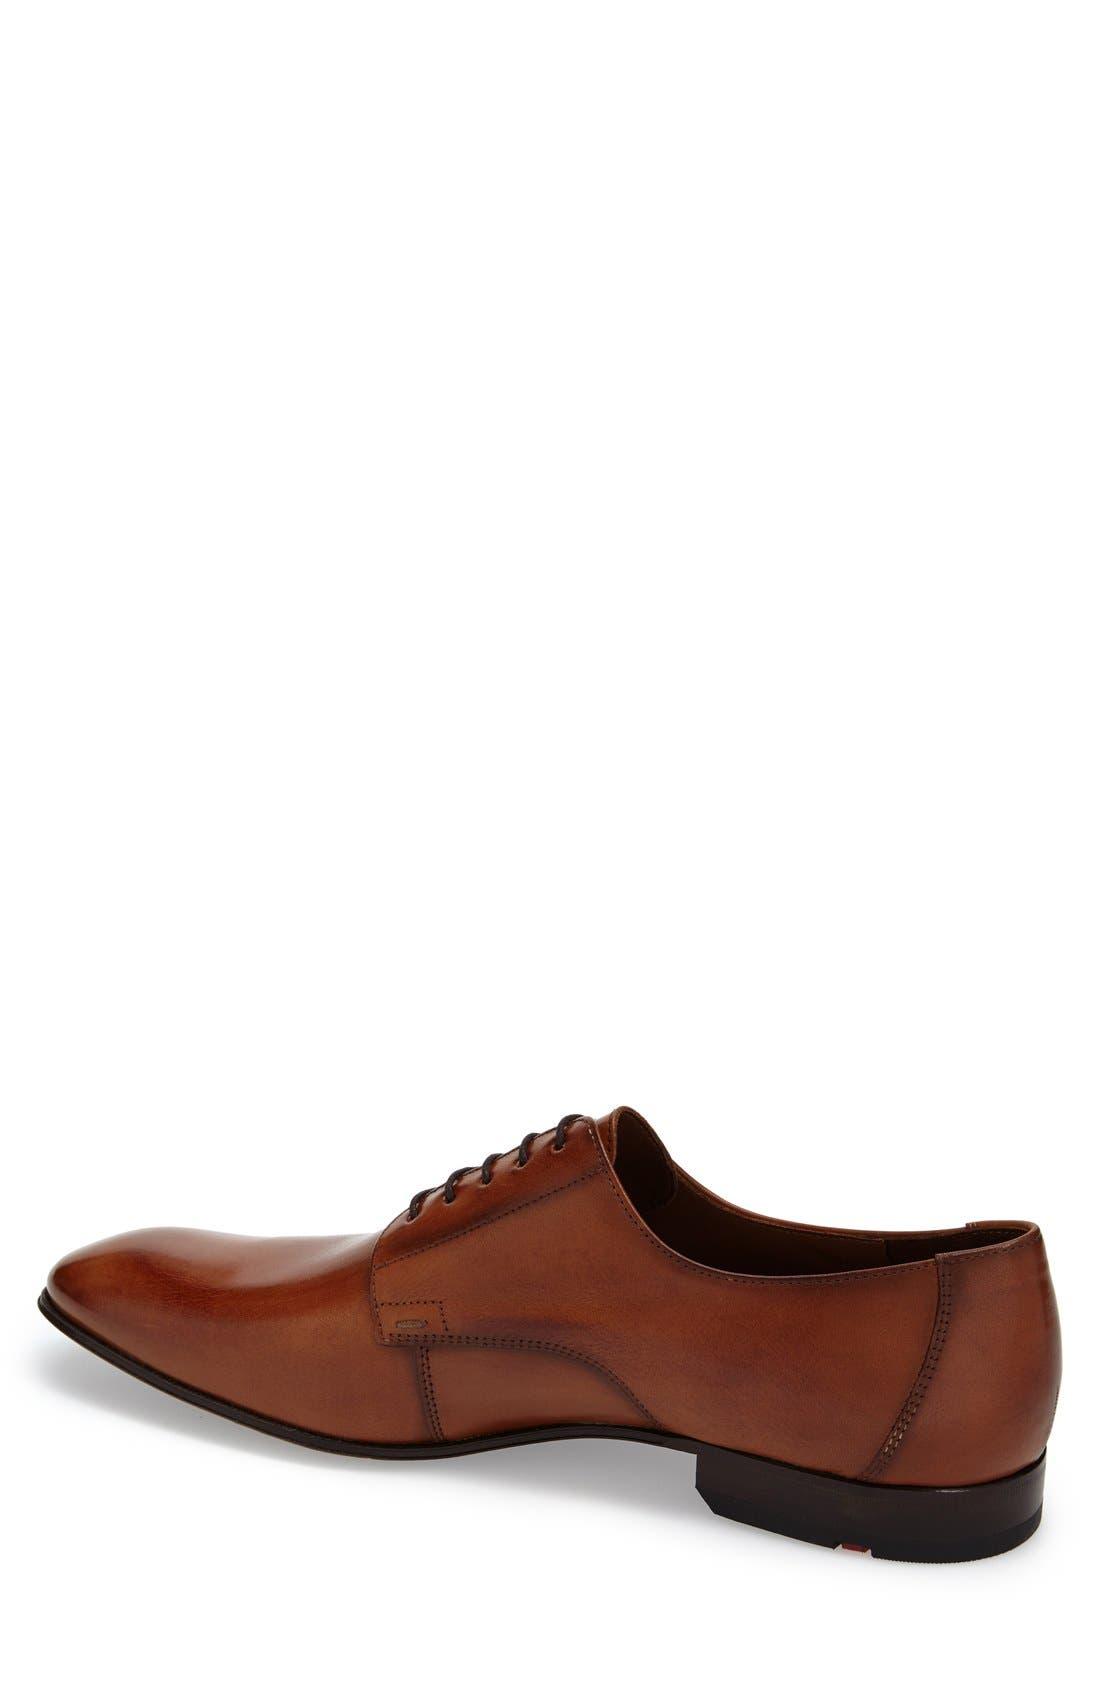 'Laurin' Plain Toe Derby,                             Alternate thumbnail 2, color,                             Light Brown